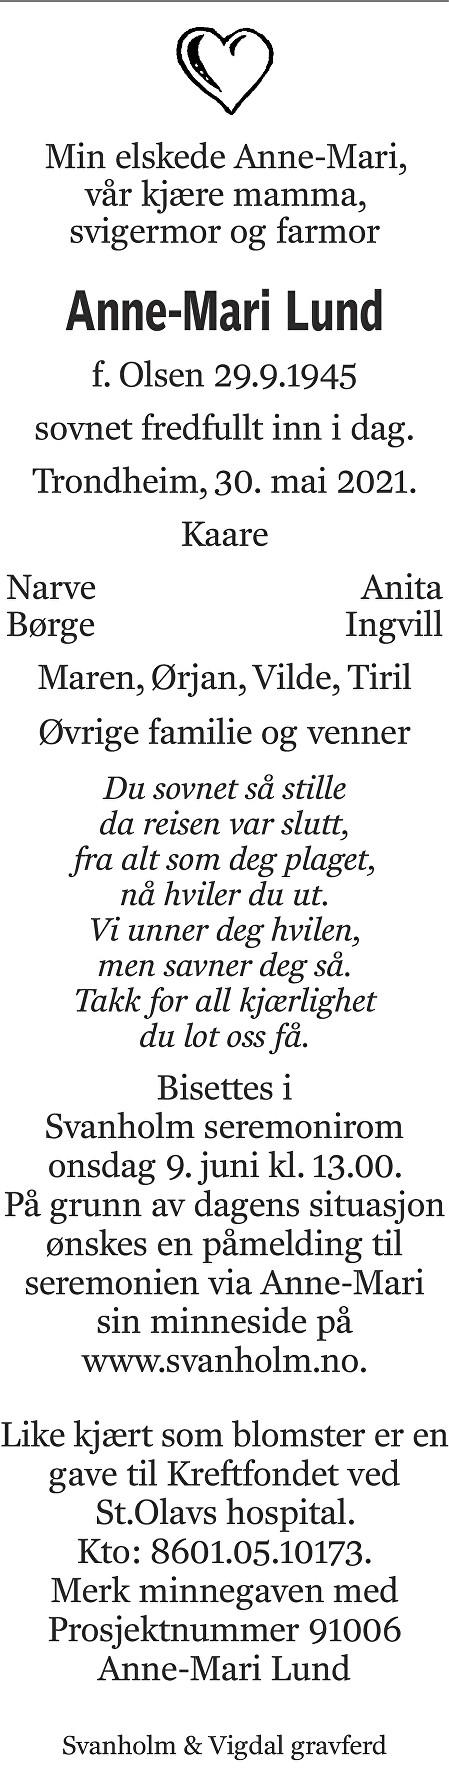 Anne-Mari Lund Dødsannonse